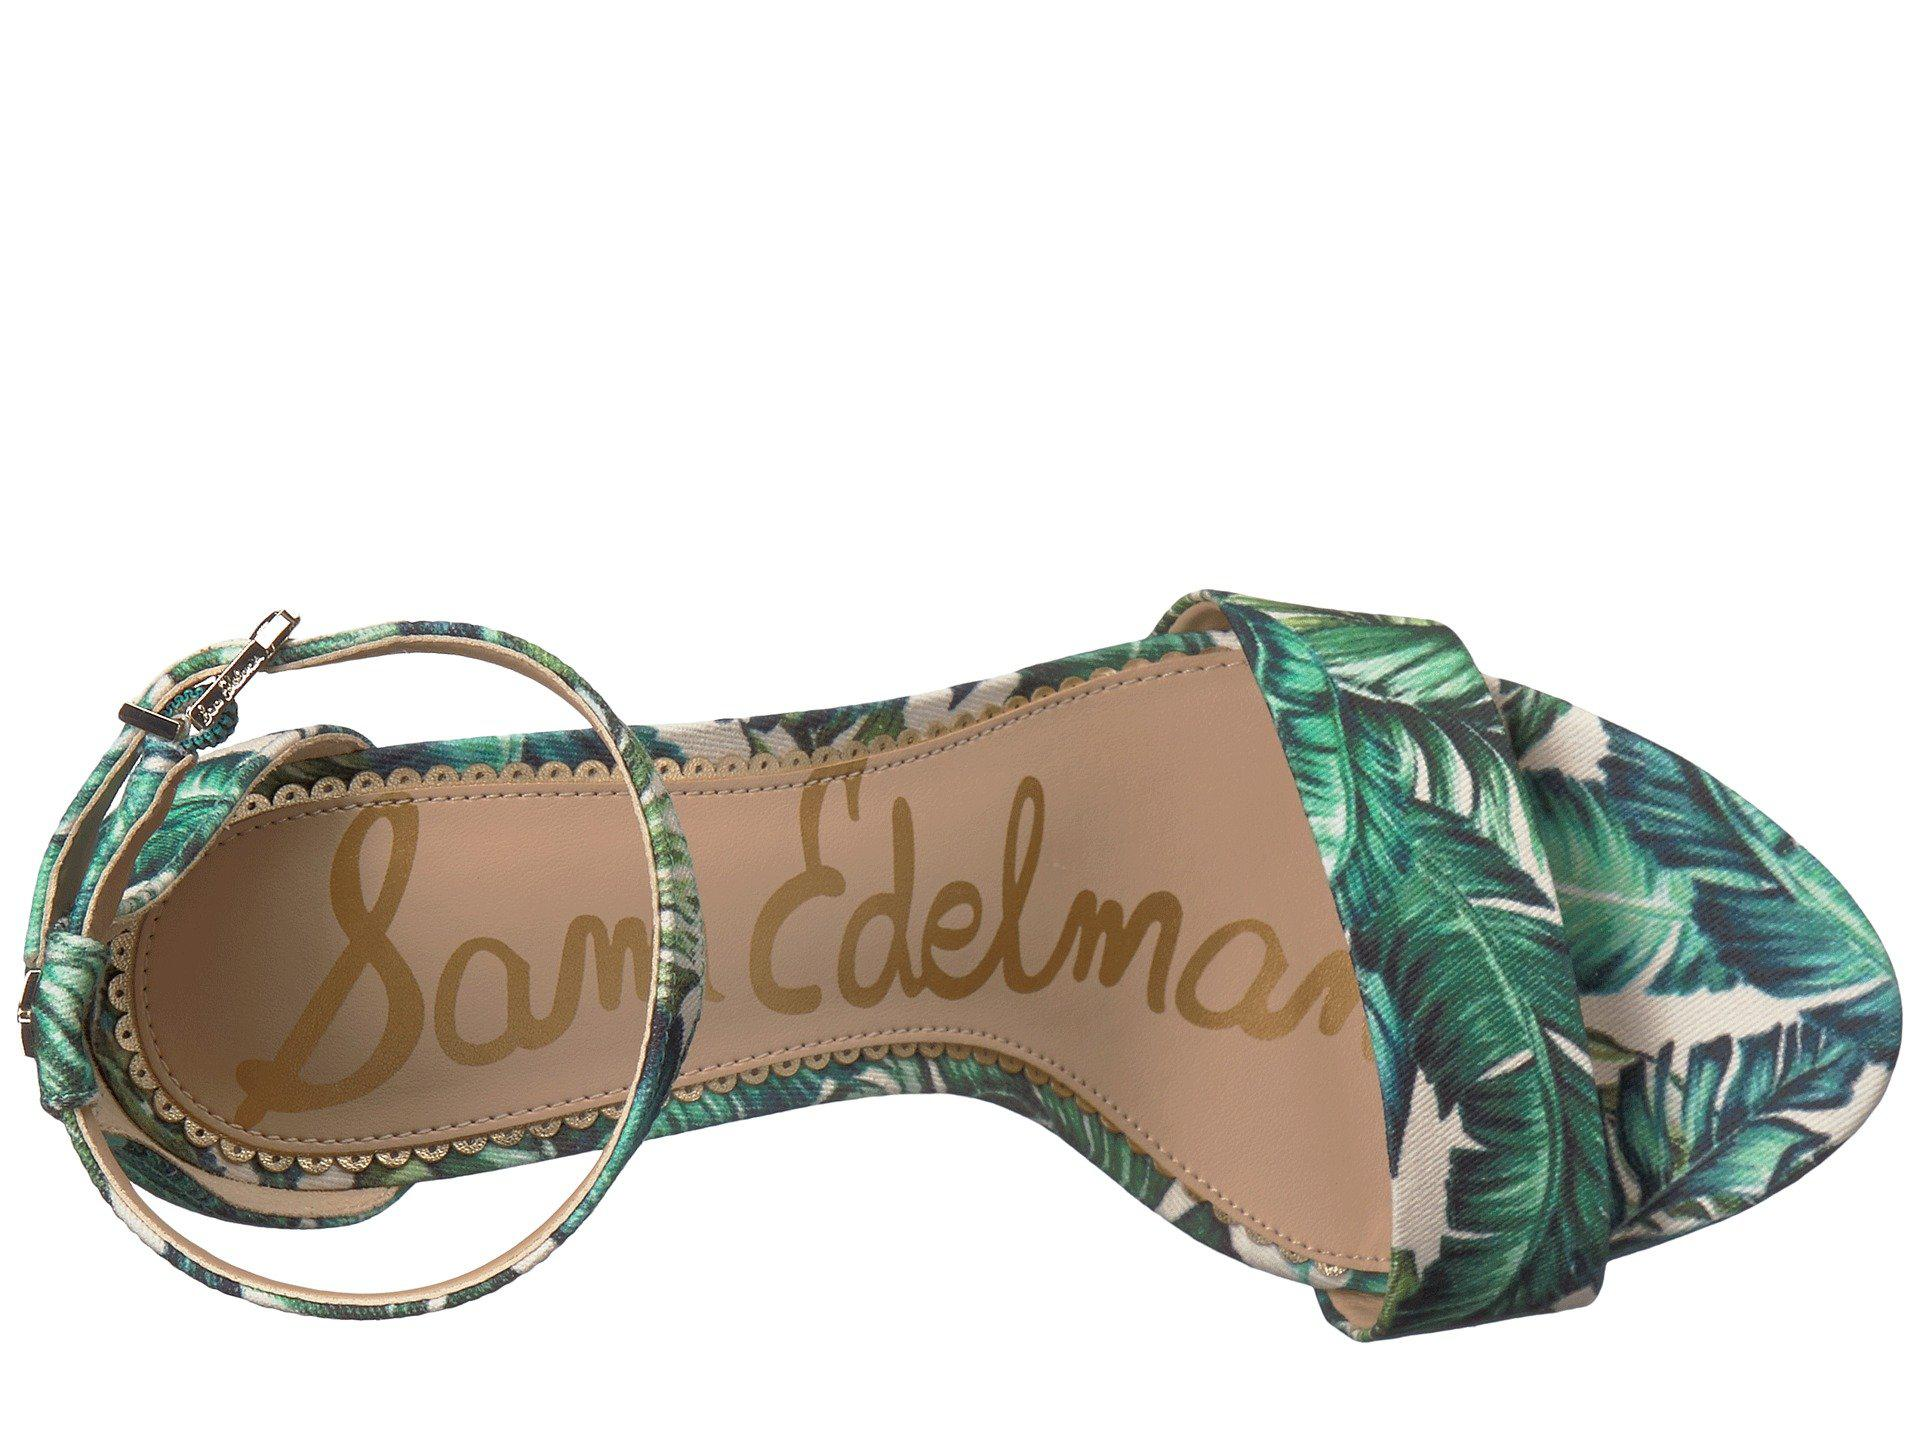 8166685881e390 Sam Edelman - Multicolor Yaro Ankle Strap Sandal Heel - Lyst. View  fullscreen